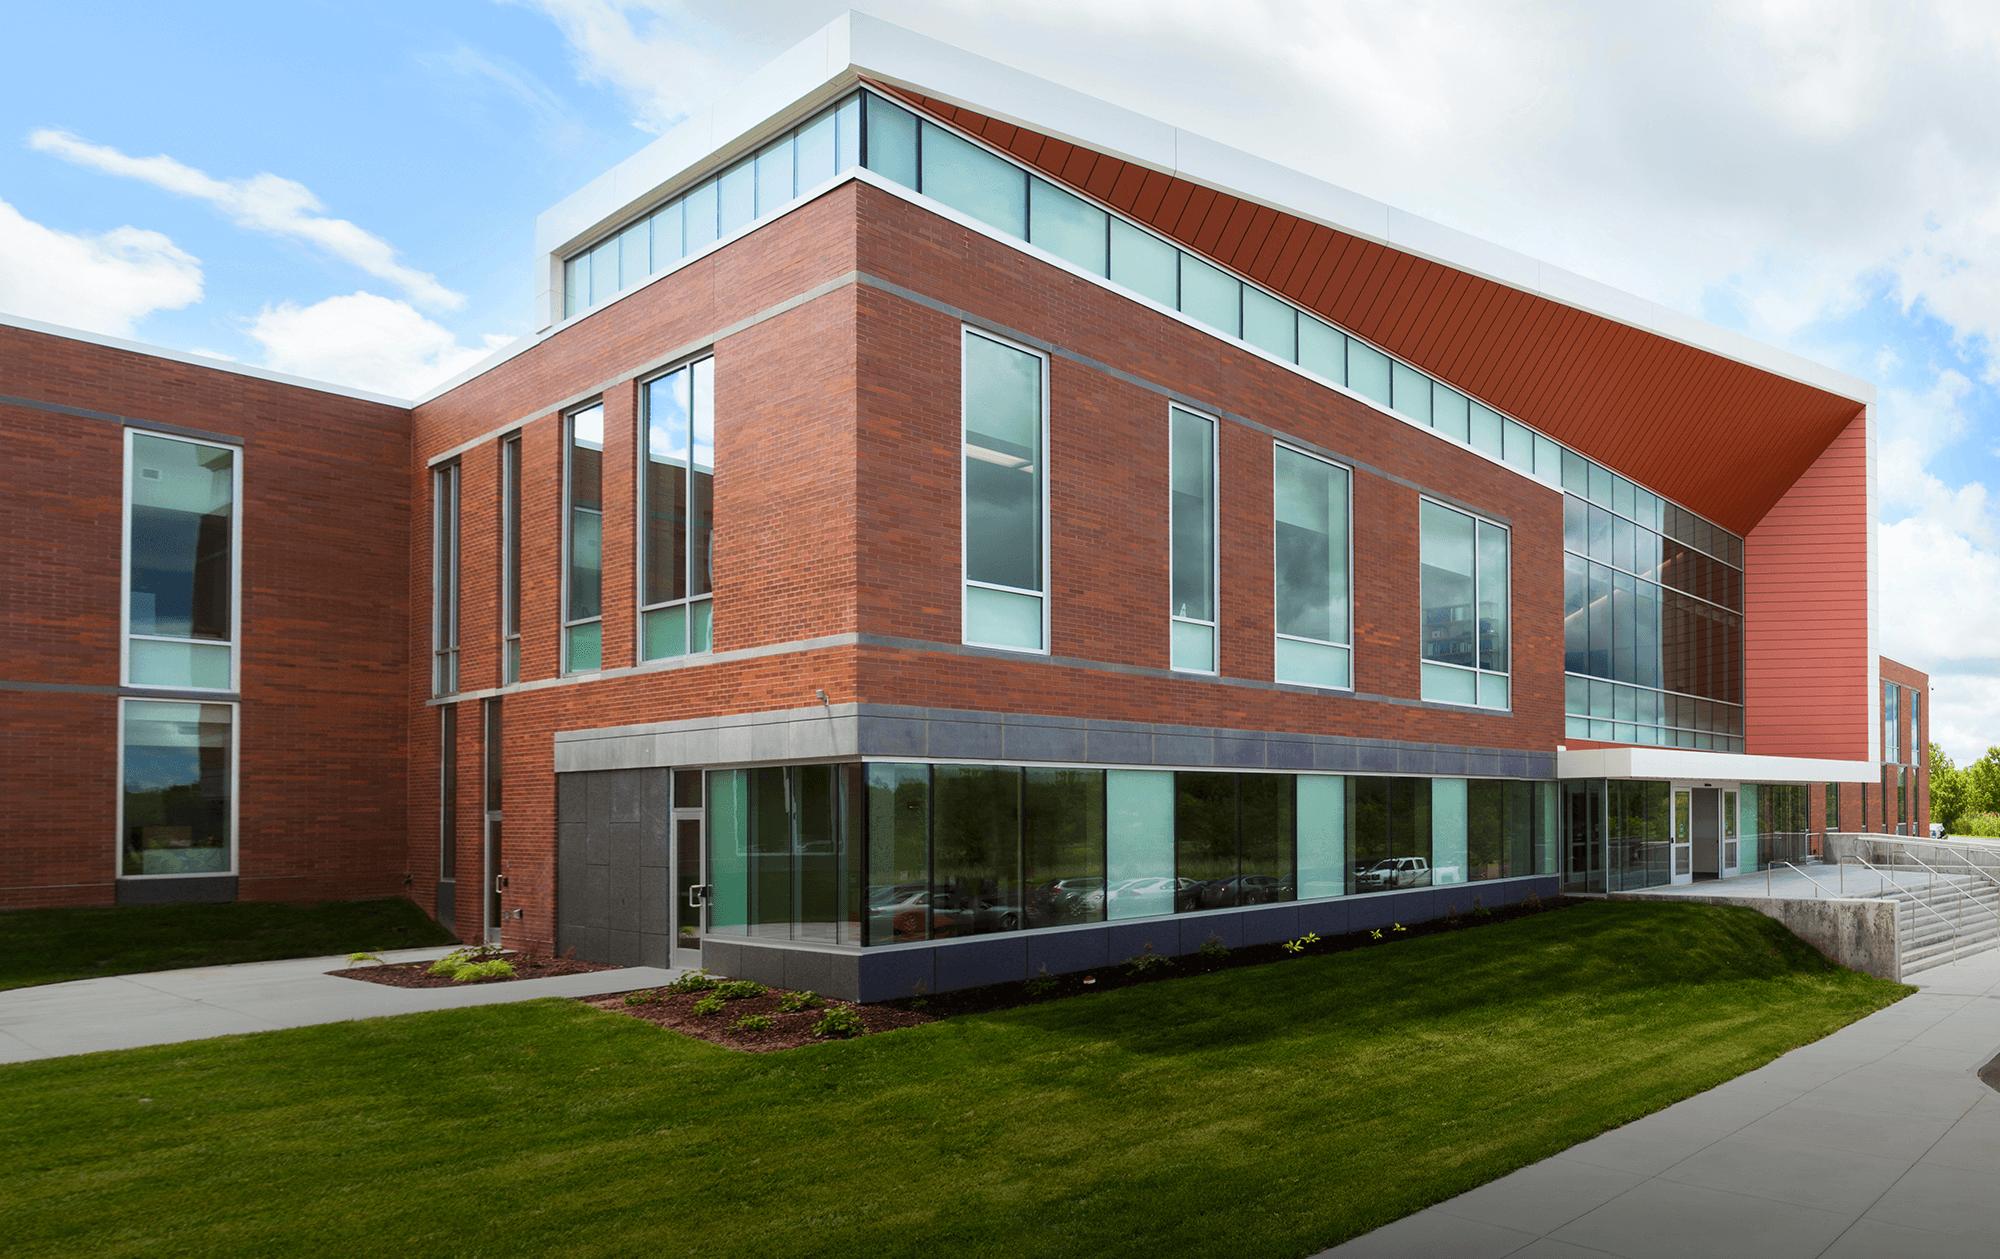 Clinical Health Sciences Center